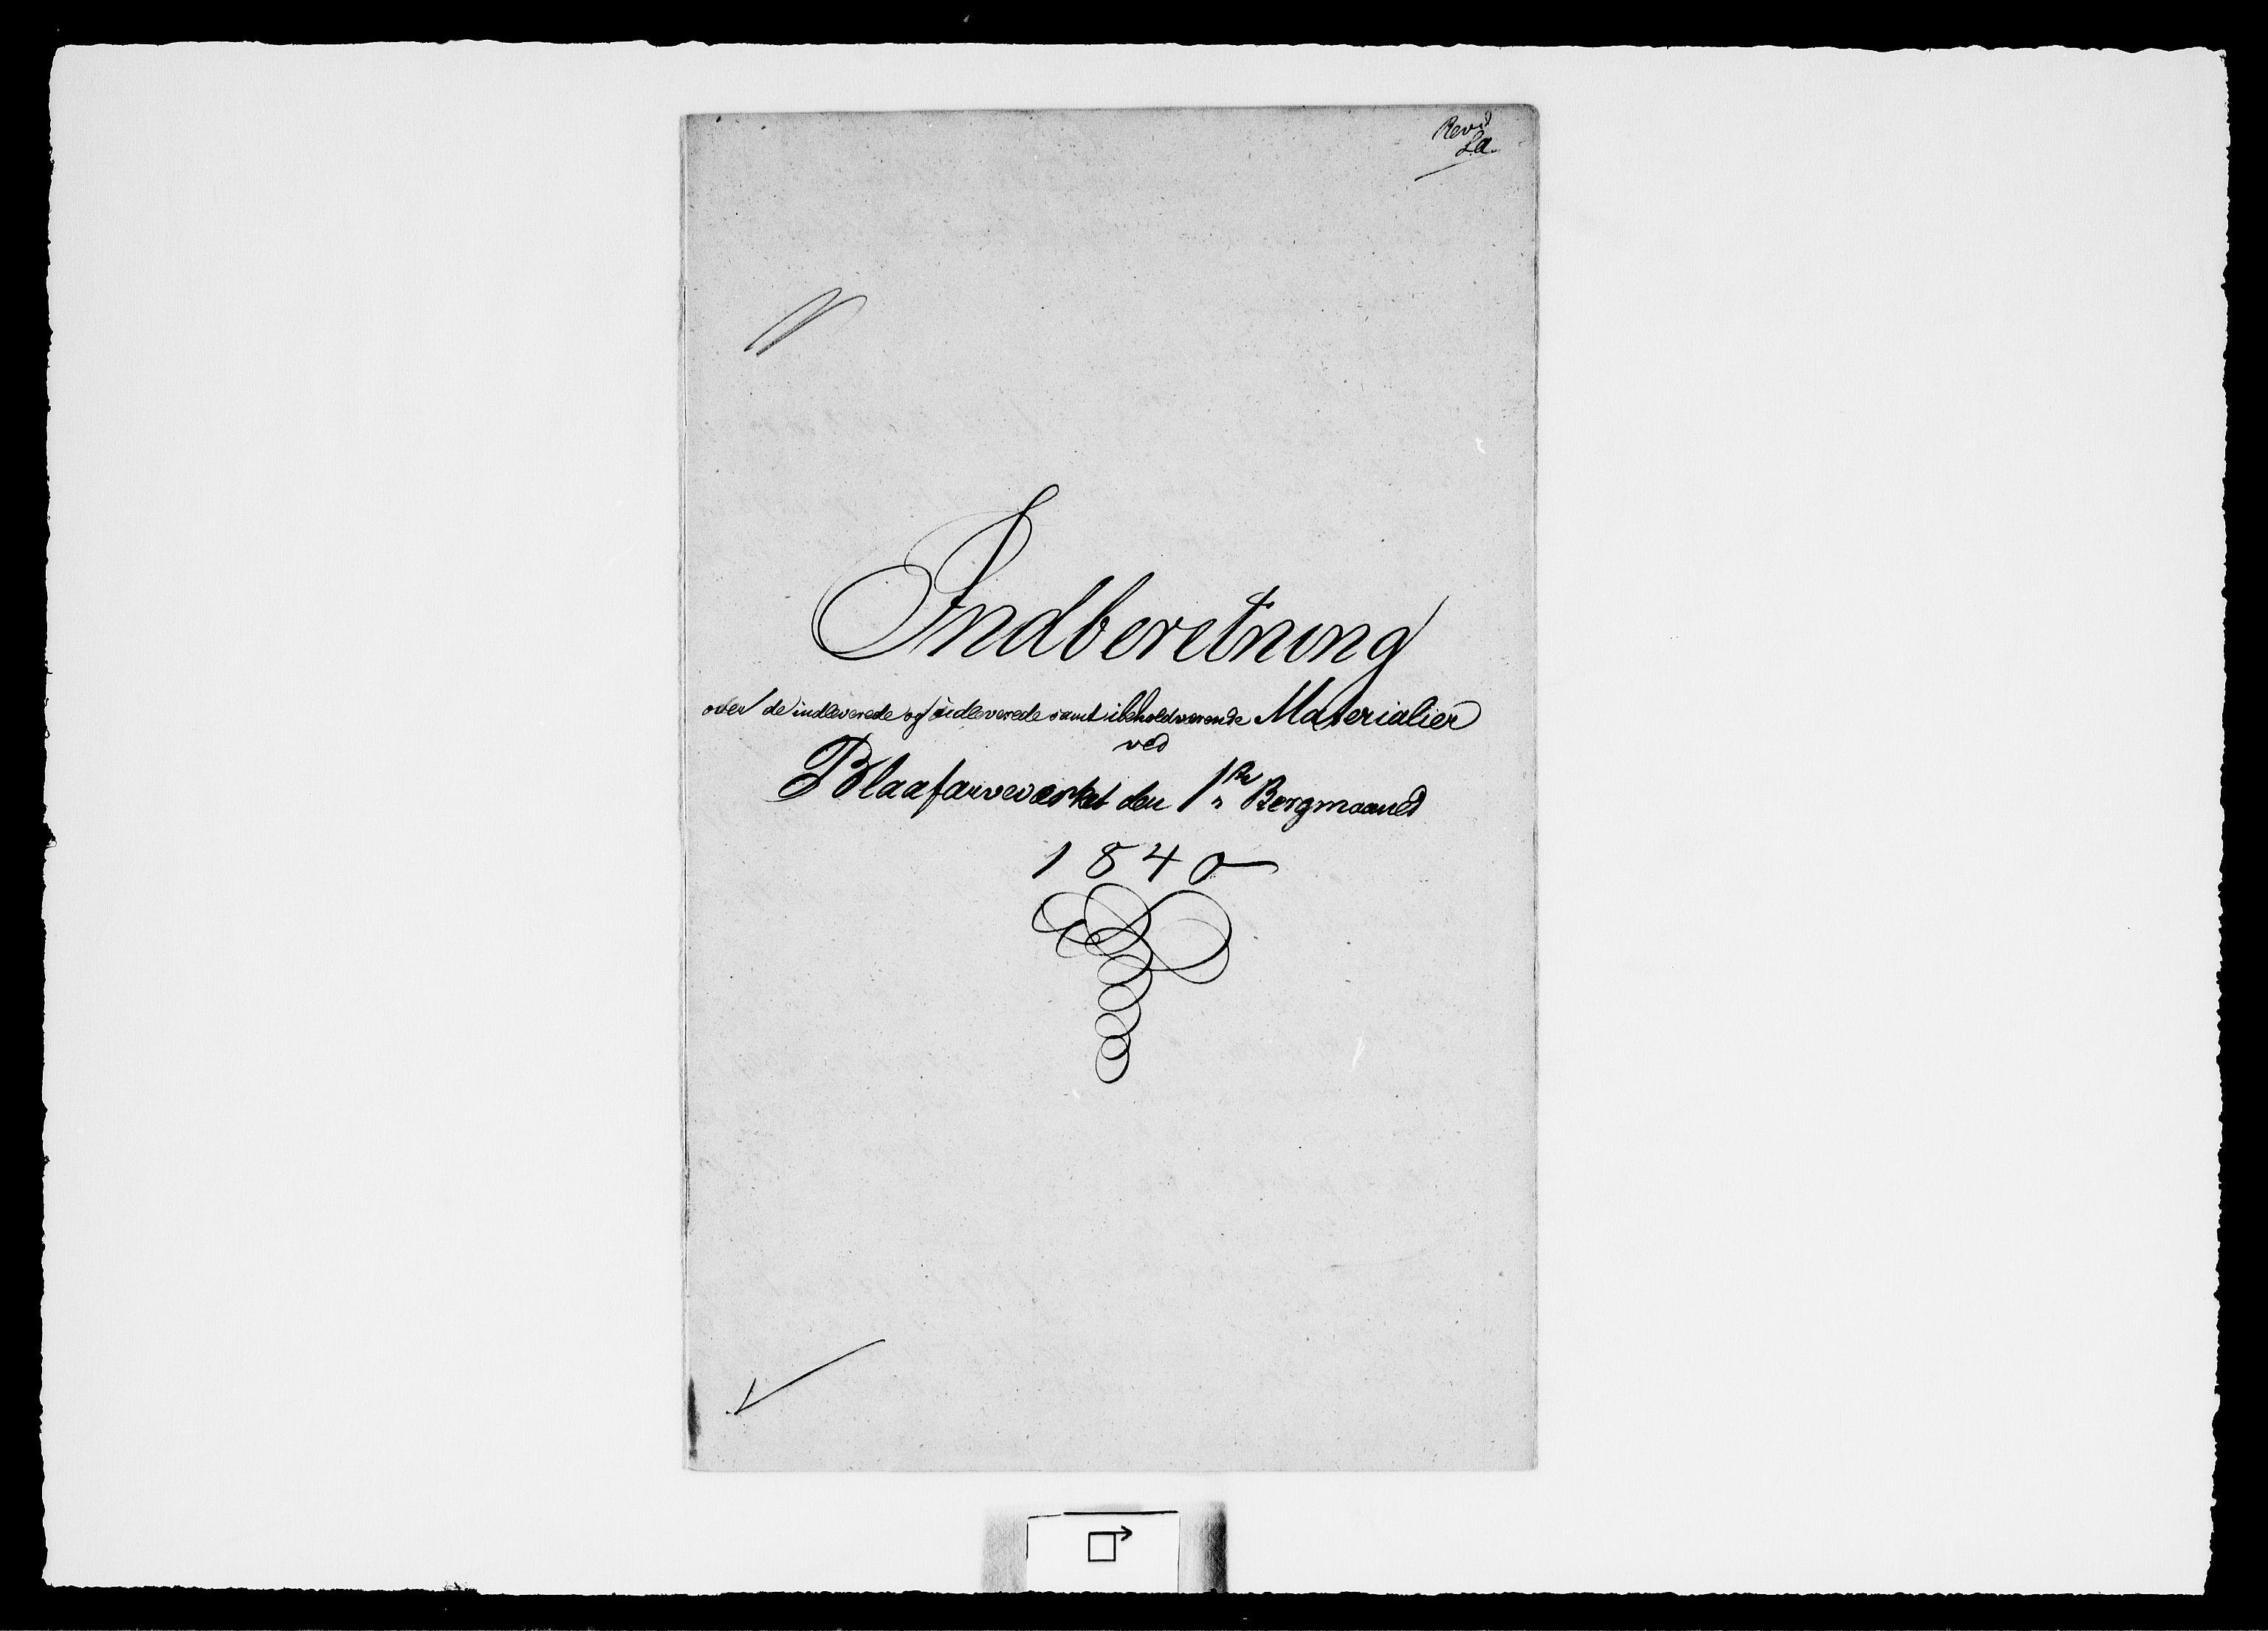 RA, Modums Blaafarveværk, G/Gd/Gdd/L0249, 1840-1849, s. 2